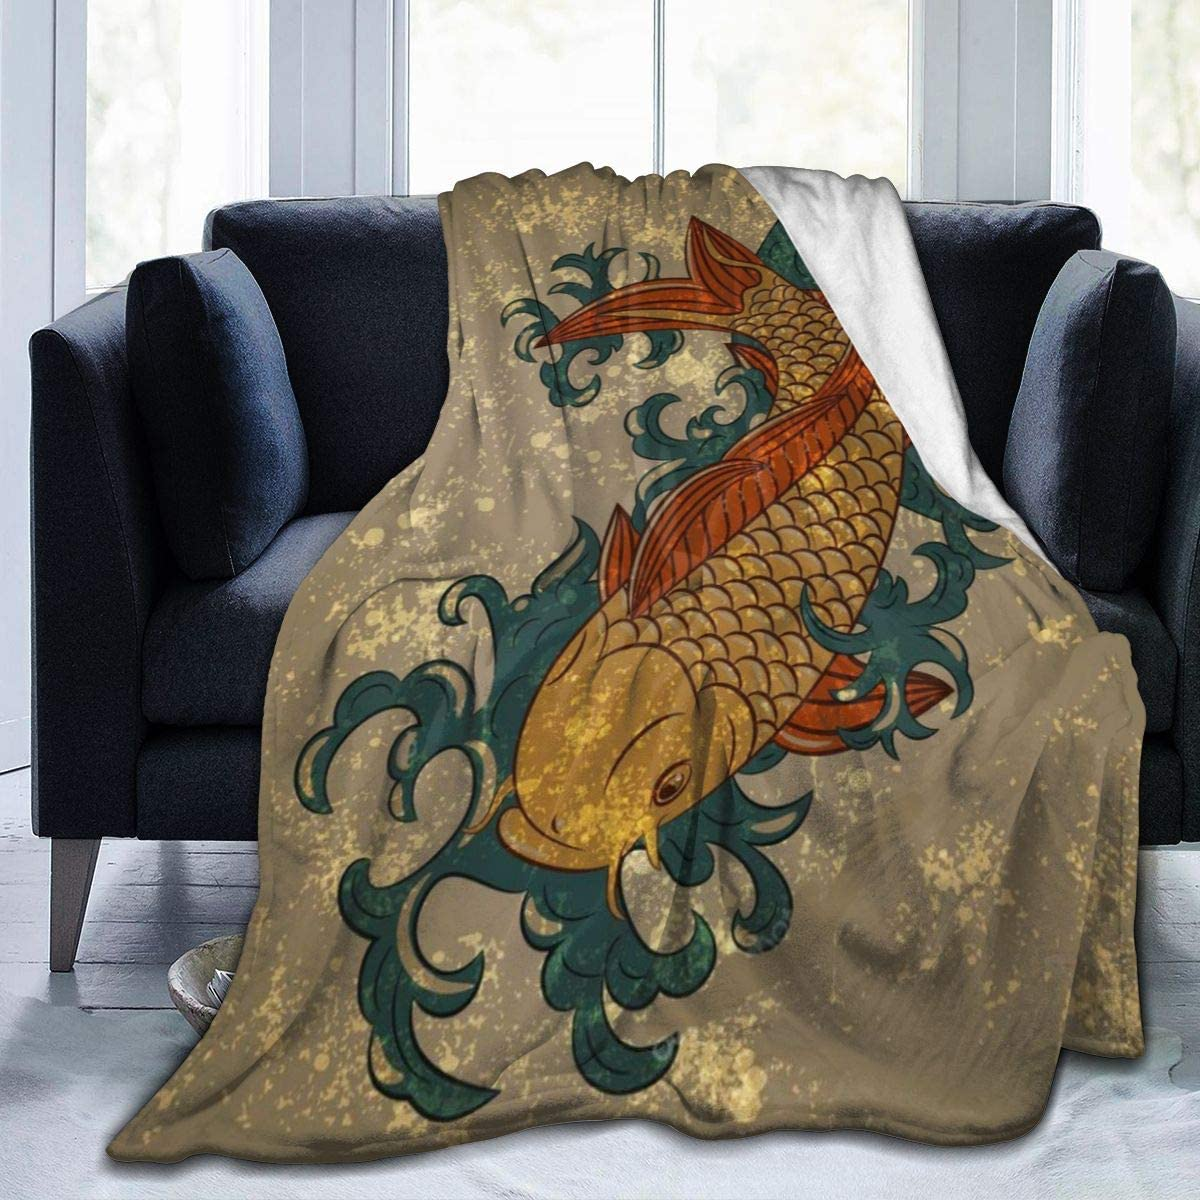 "Japanese Decor Oriental Pattern Koi Fish Throw Fleece Blanket Flannel Ultra Soft Lightweight Microfiber Luxury Air Conditioner Quilt for Sofa Bedroom Office Travel All Season S 50""X40"""